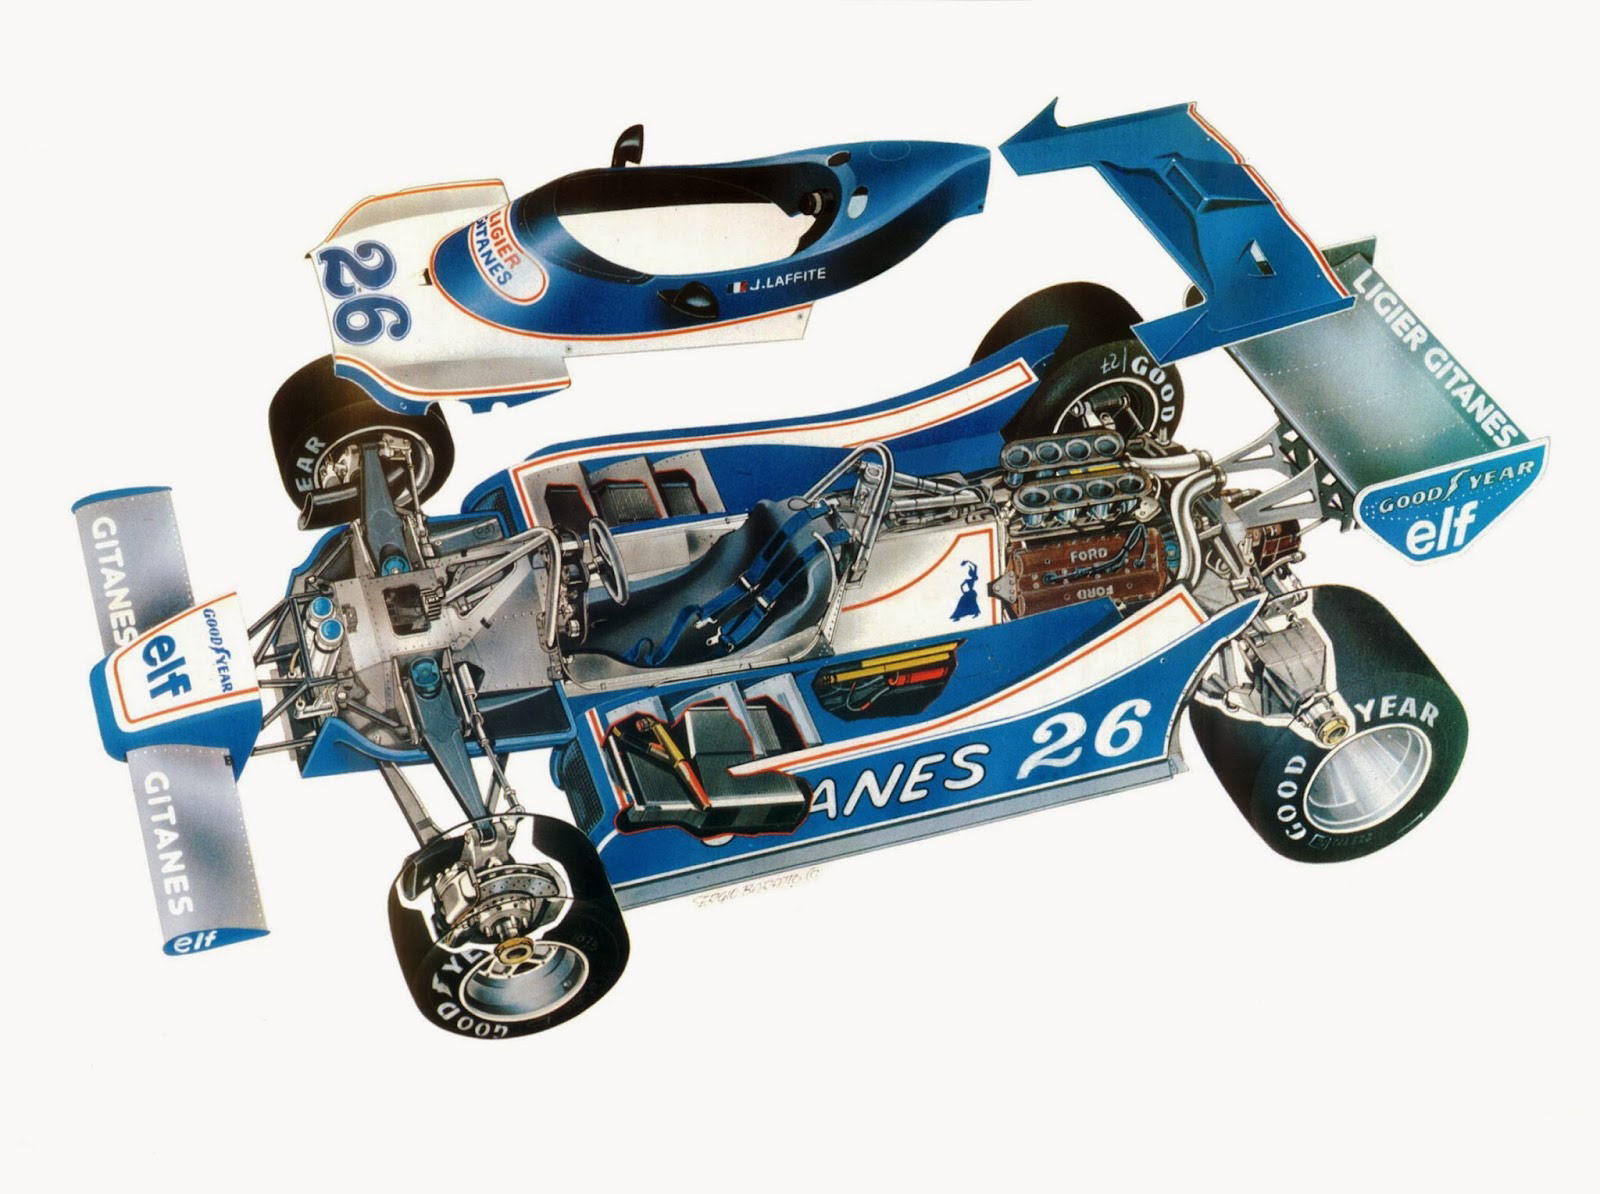 Ligier JS11 cutaway